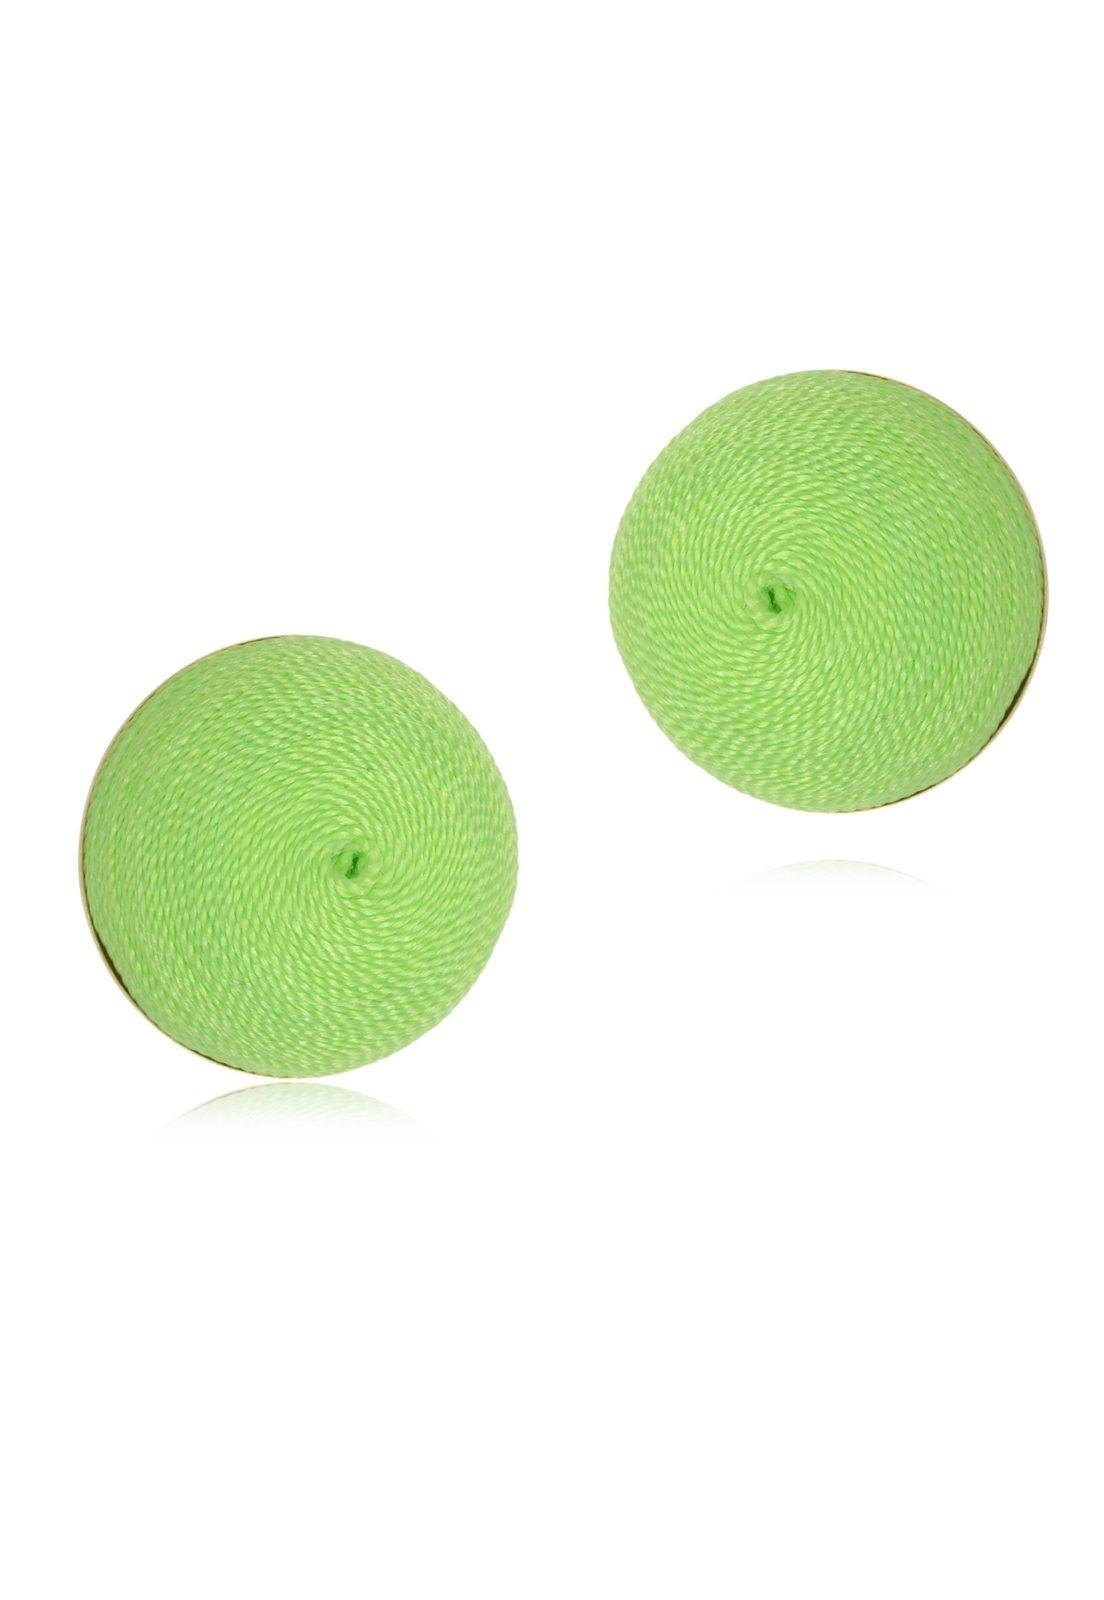 Brinco Le Diamond Botão De Seda Verde Fluorescente